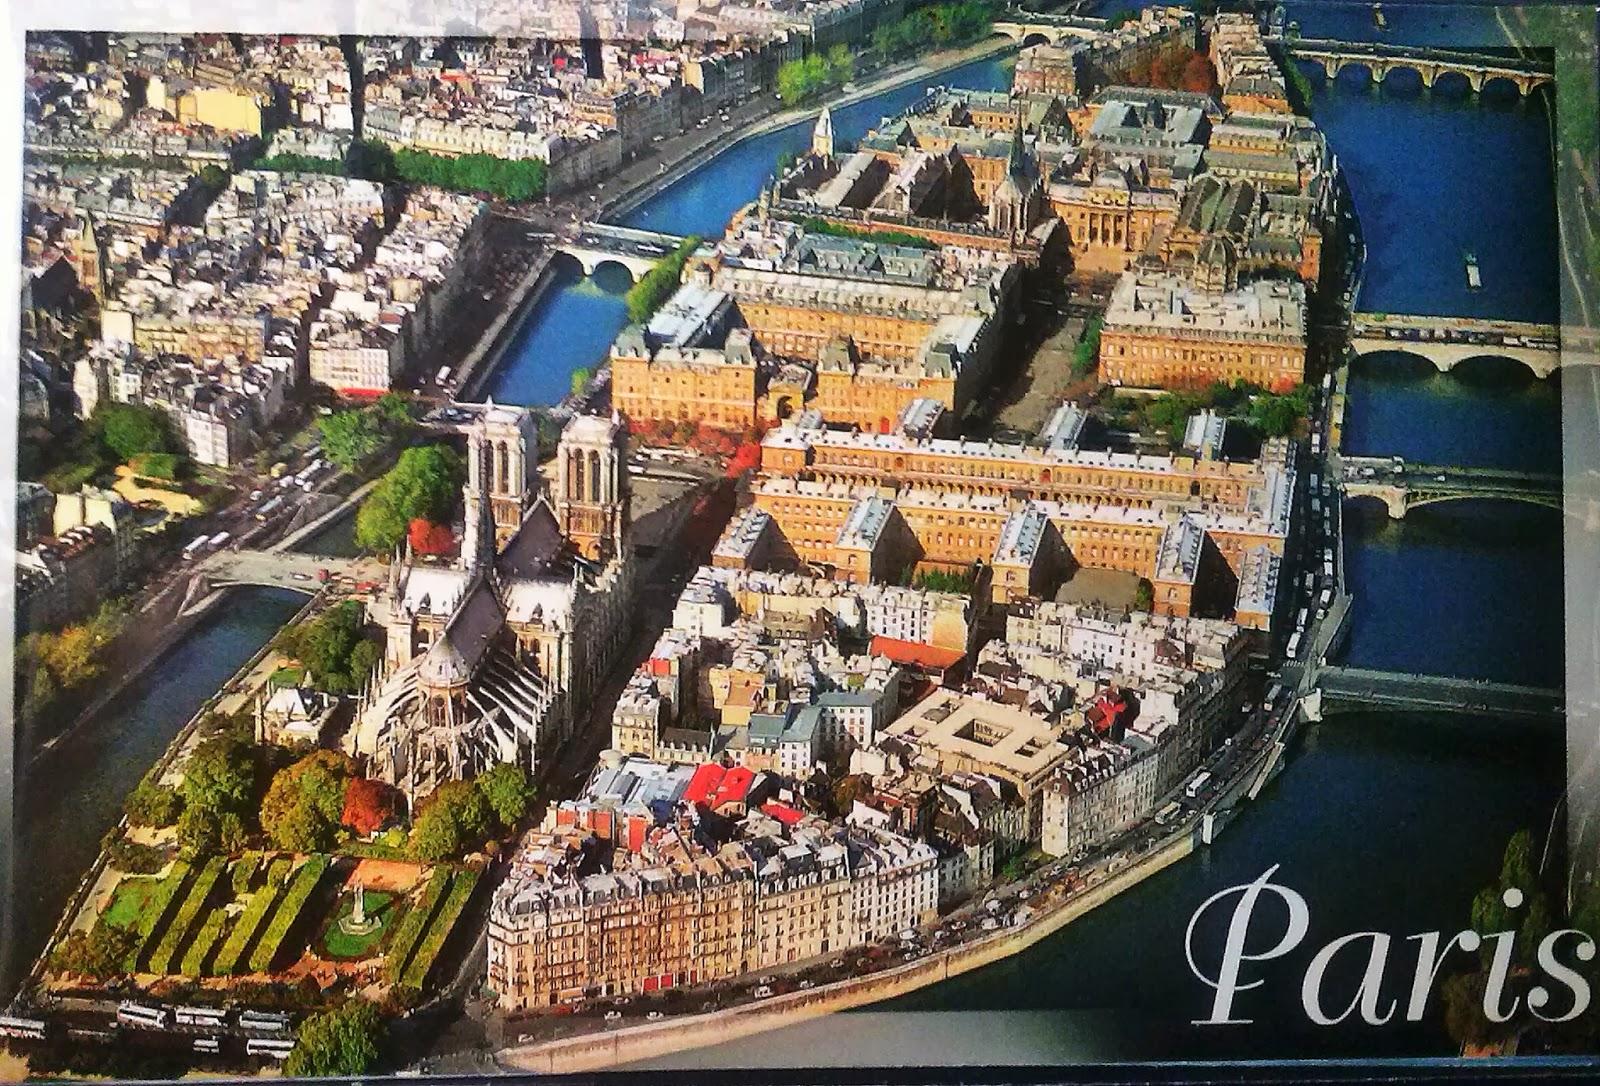 Mi Coleccin De Tarjetas Postales La Isla De La Cit Francia